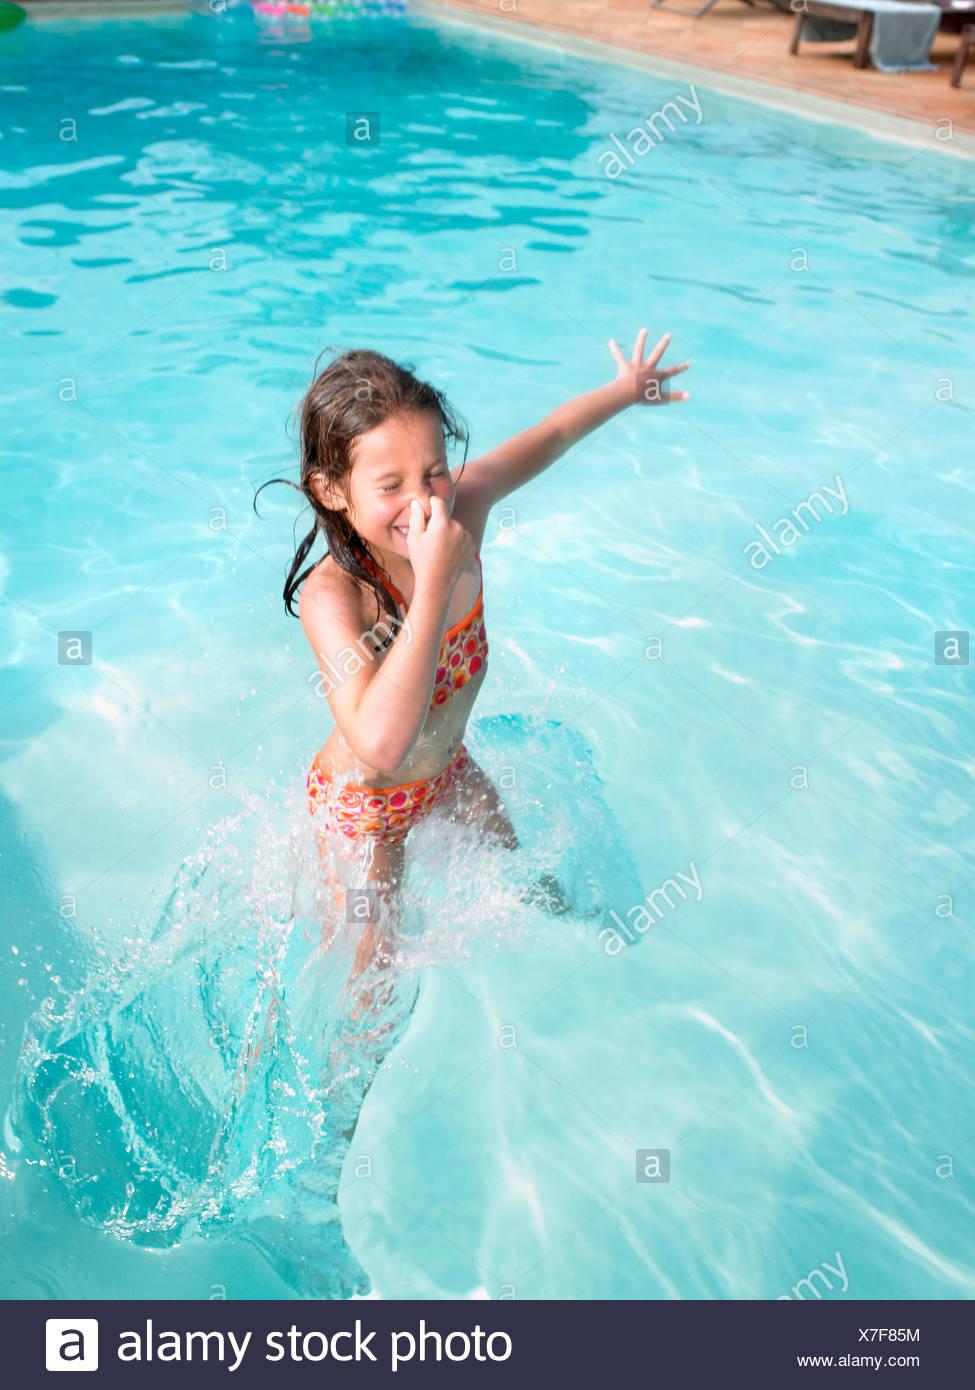 Girl jumping in swimming pool. Stock Photo